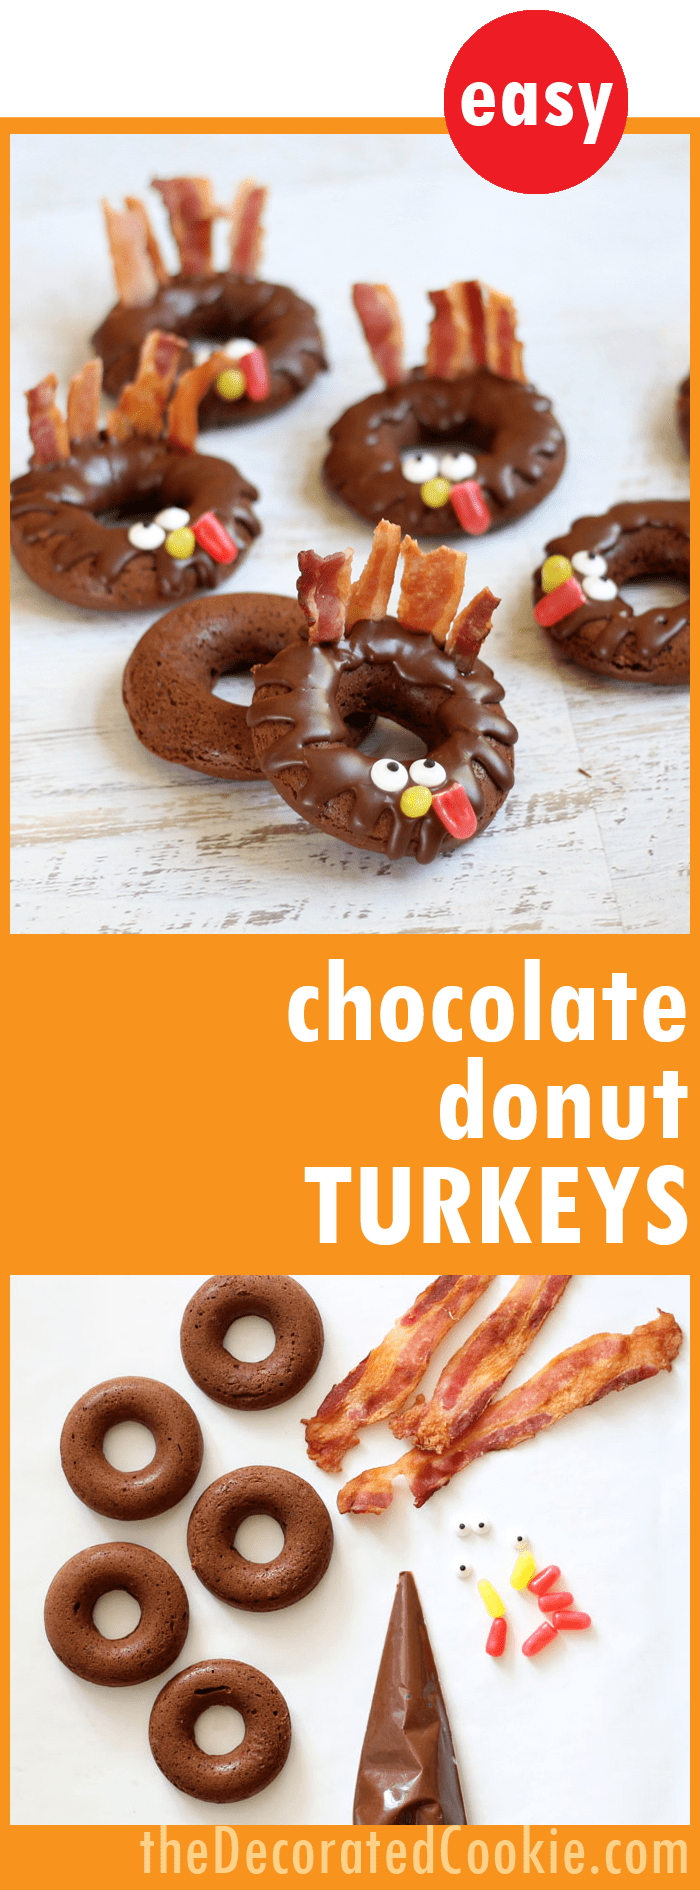 Baked Chocolate Donut Turkeys For A Thanksgiving Breakfast